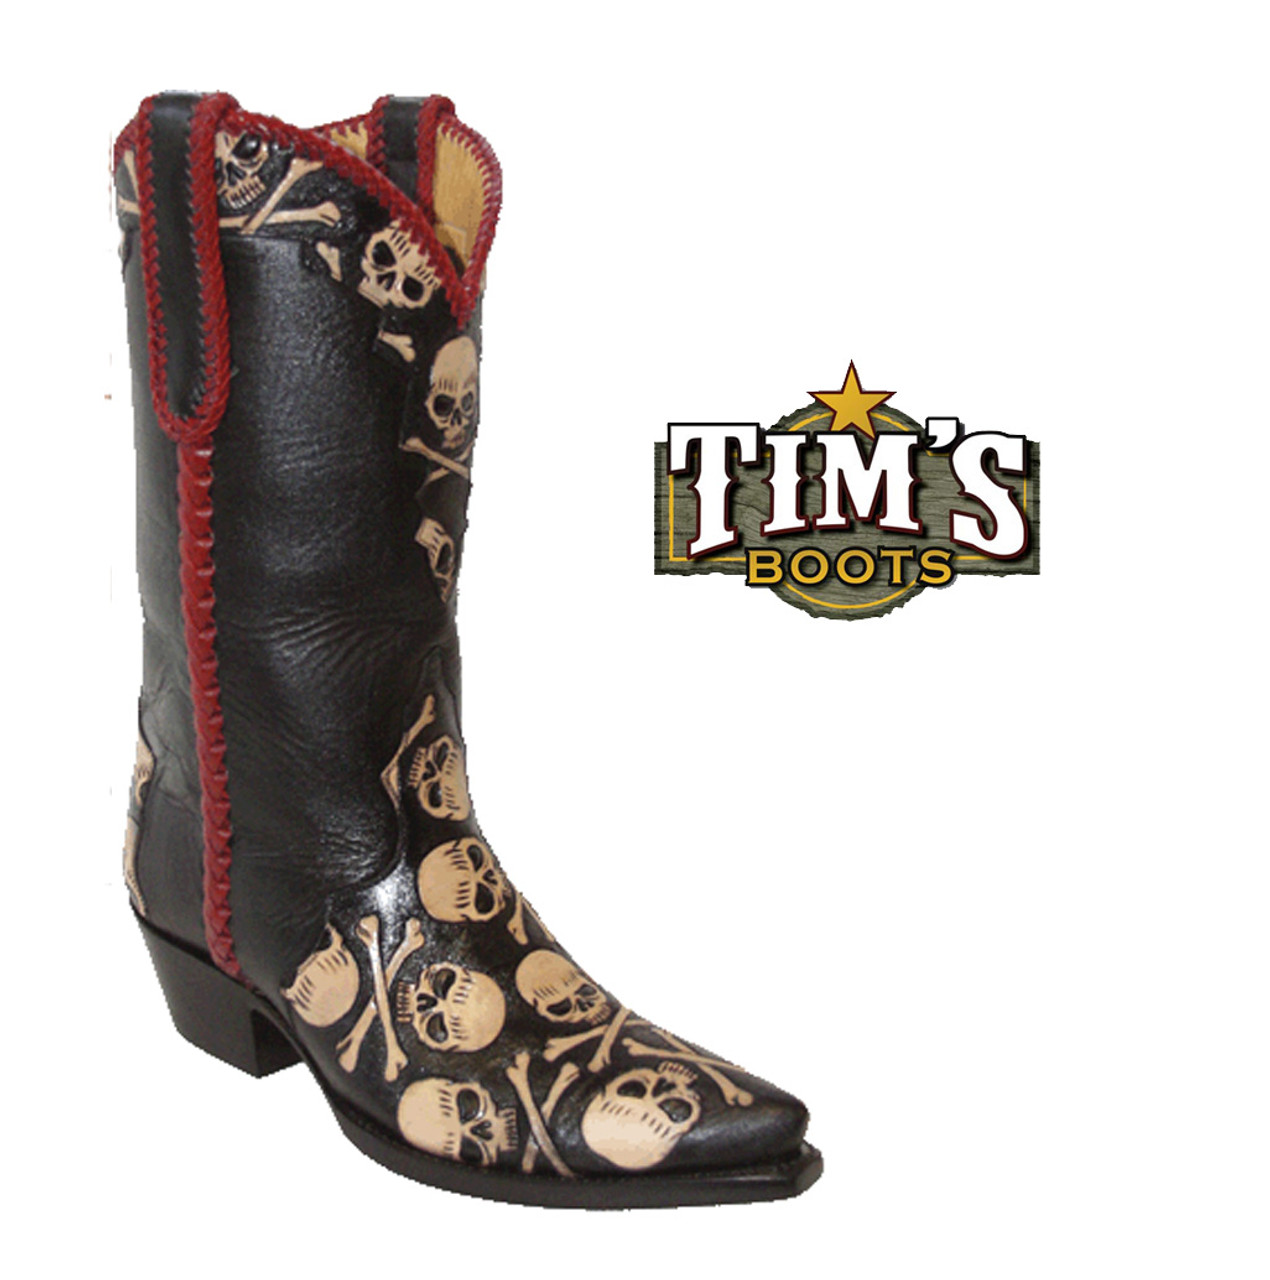 70af788ff38 Hand Tooled Skull & Crossbones Cowboy Boots - Women's